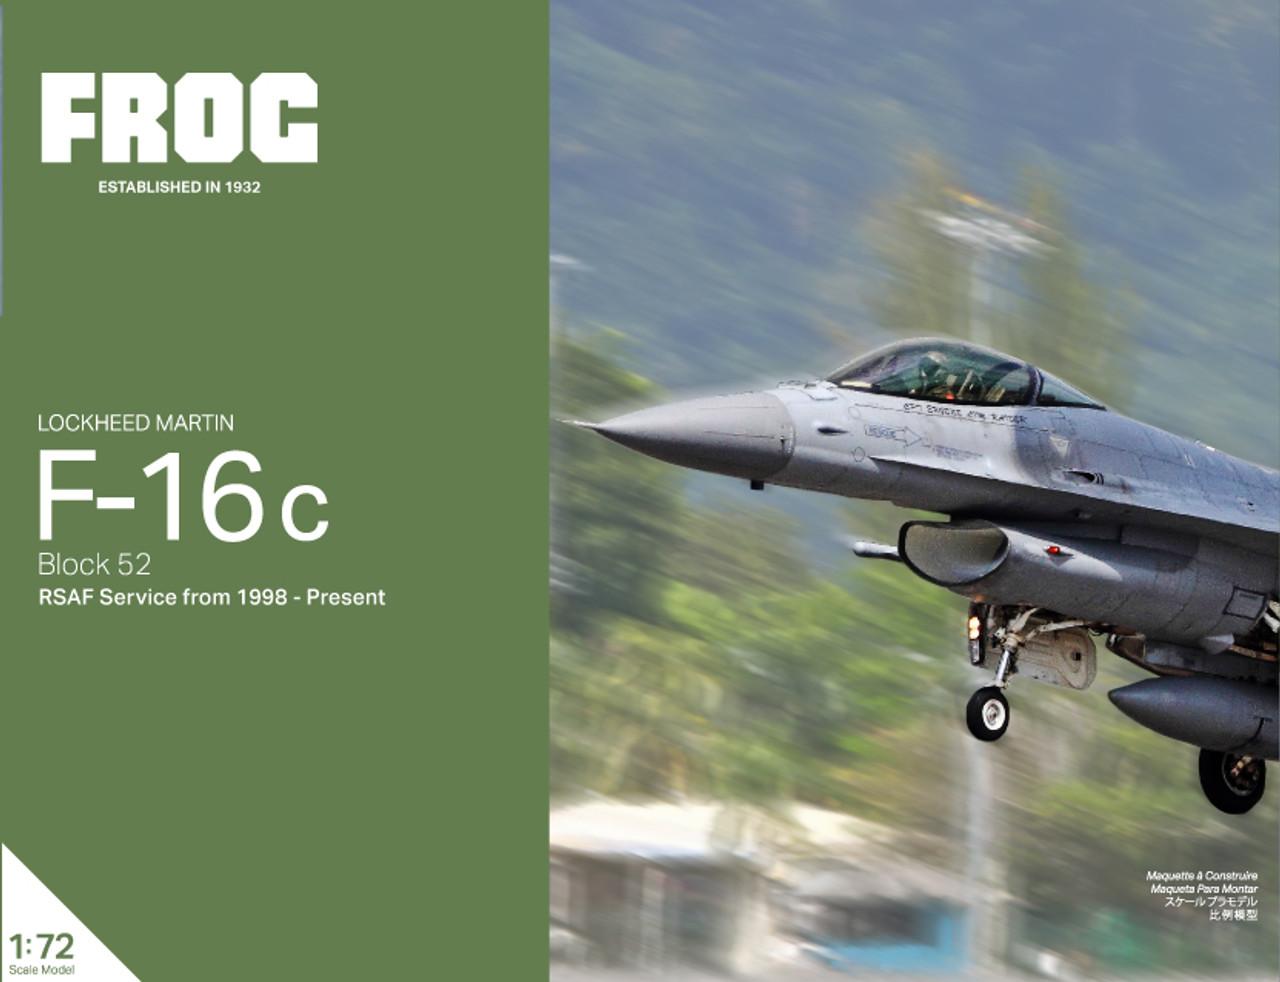 Frog Lockheed Martin F-16C Republic of Singapore Kit 1:72